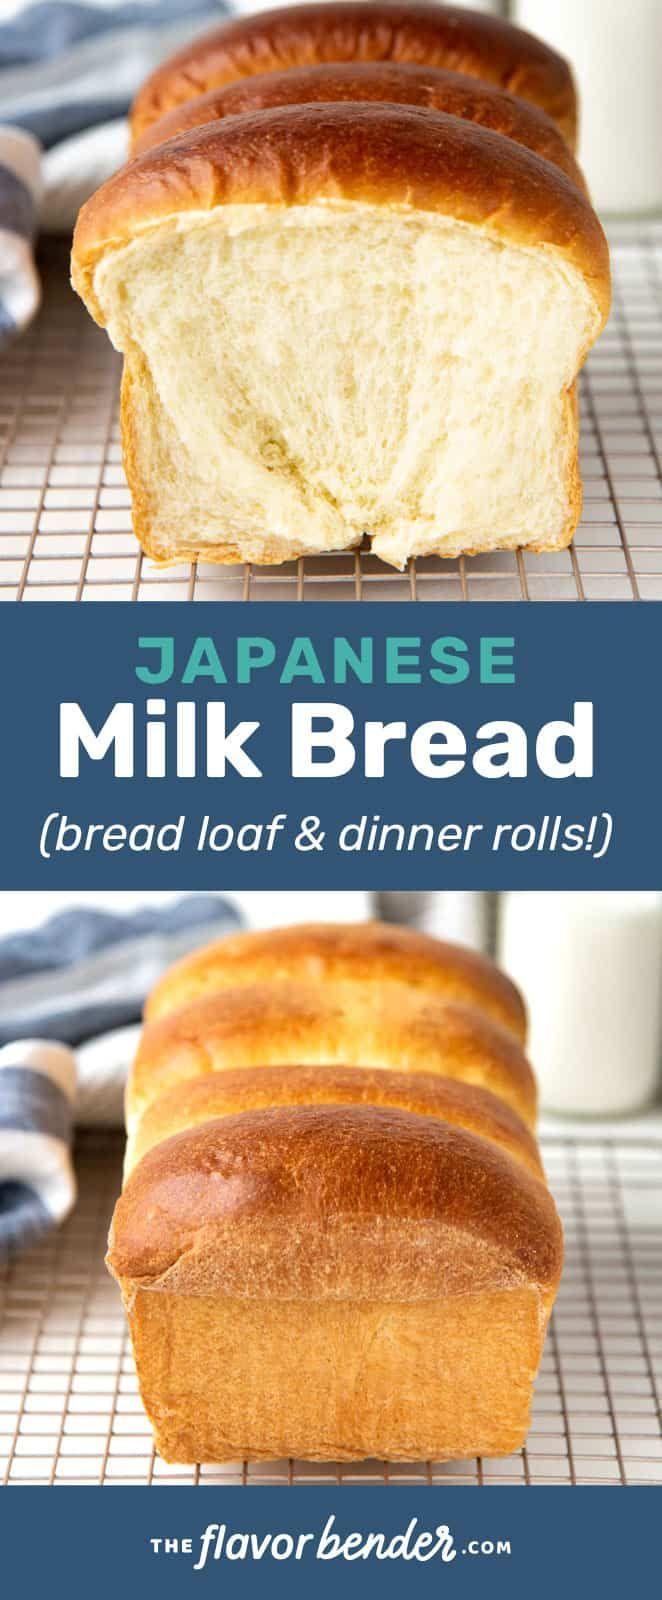 Japanese Milk Bread Recipe Hokkaido Milk Bread The Flavor Bender In 2020 Milk Bread Recipe Bread Recipes Sweet Bread Recipes Homemade